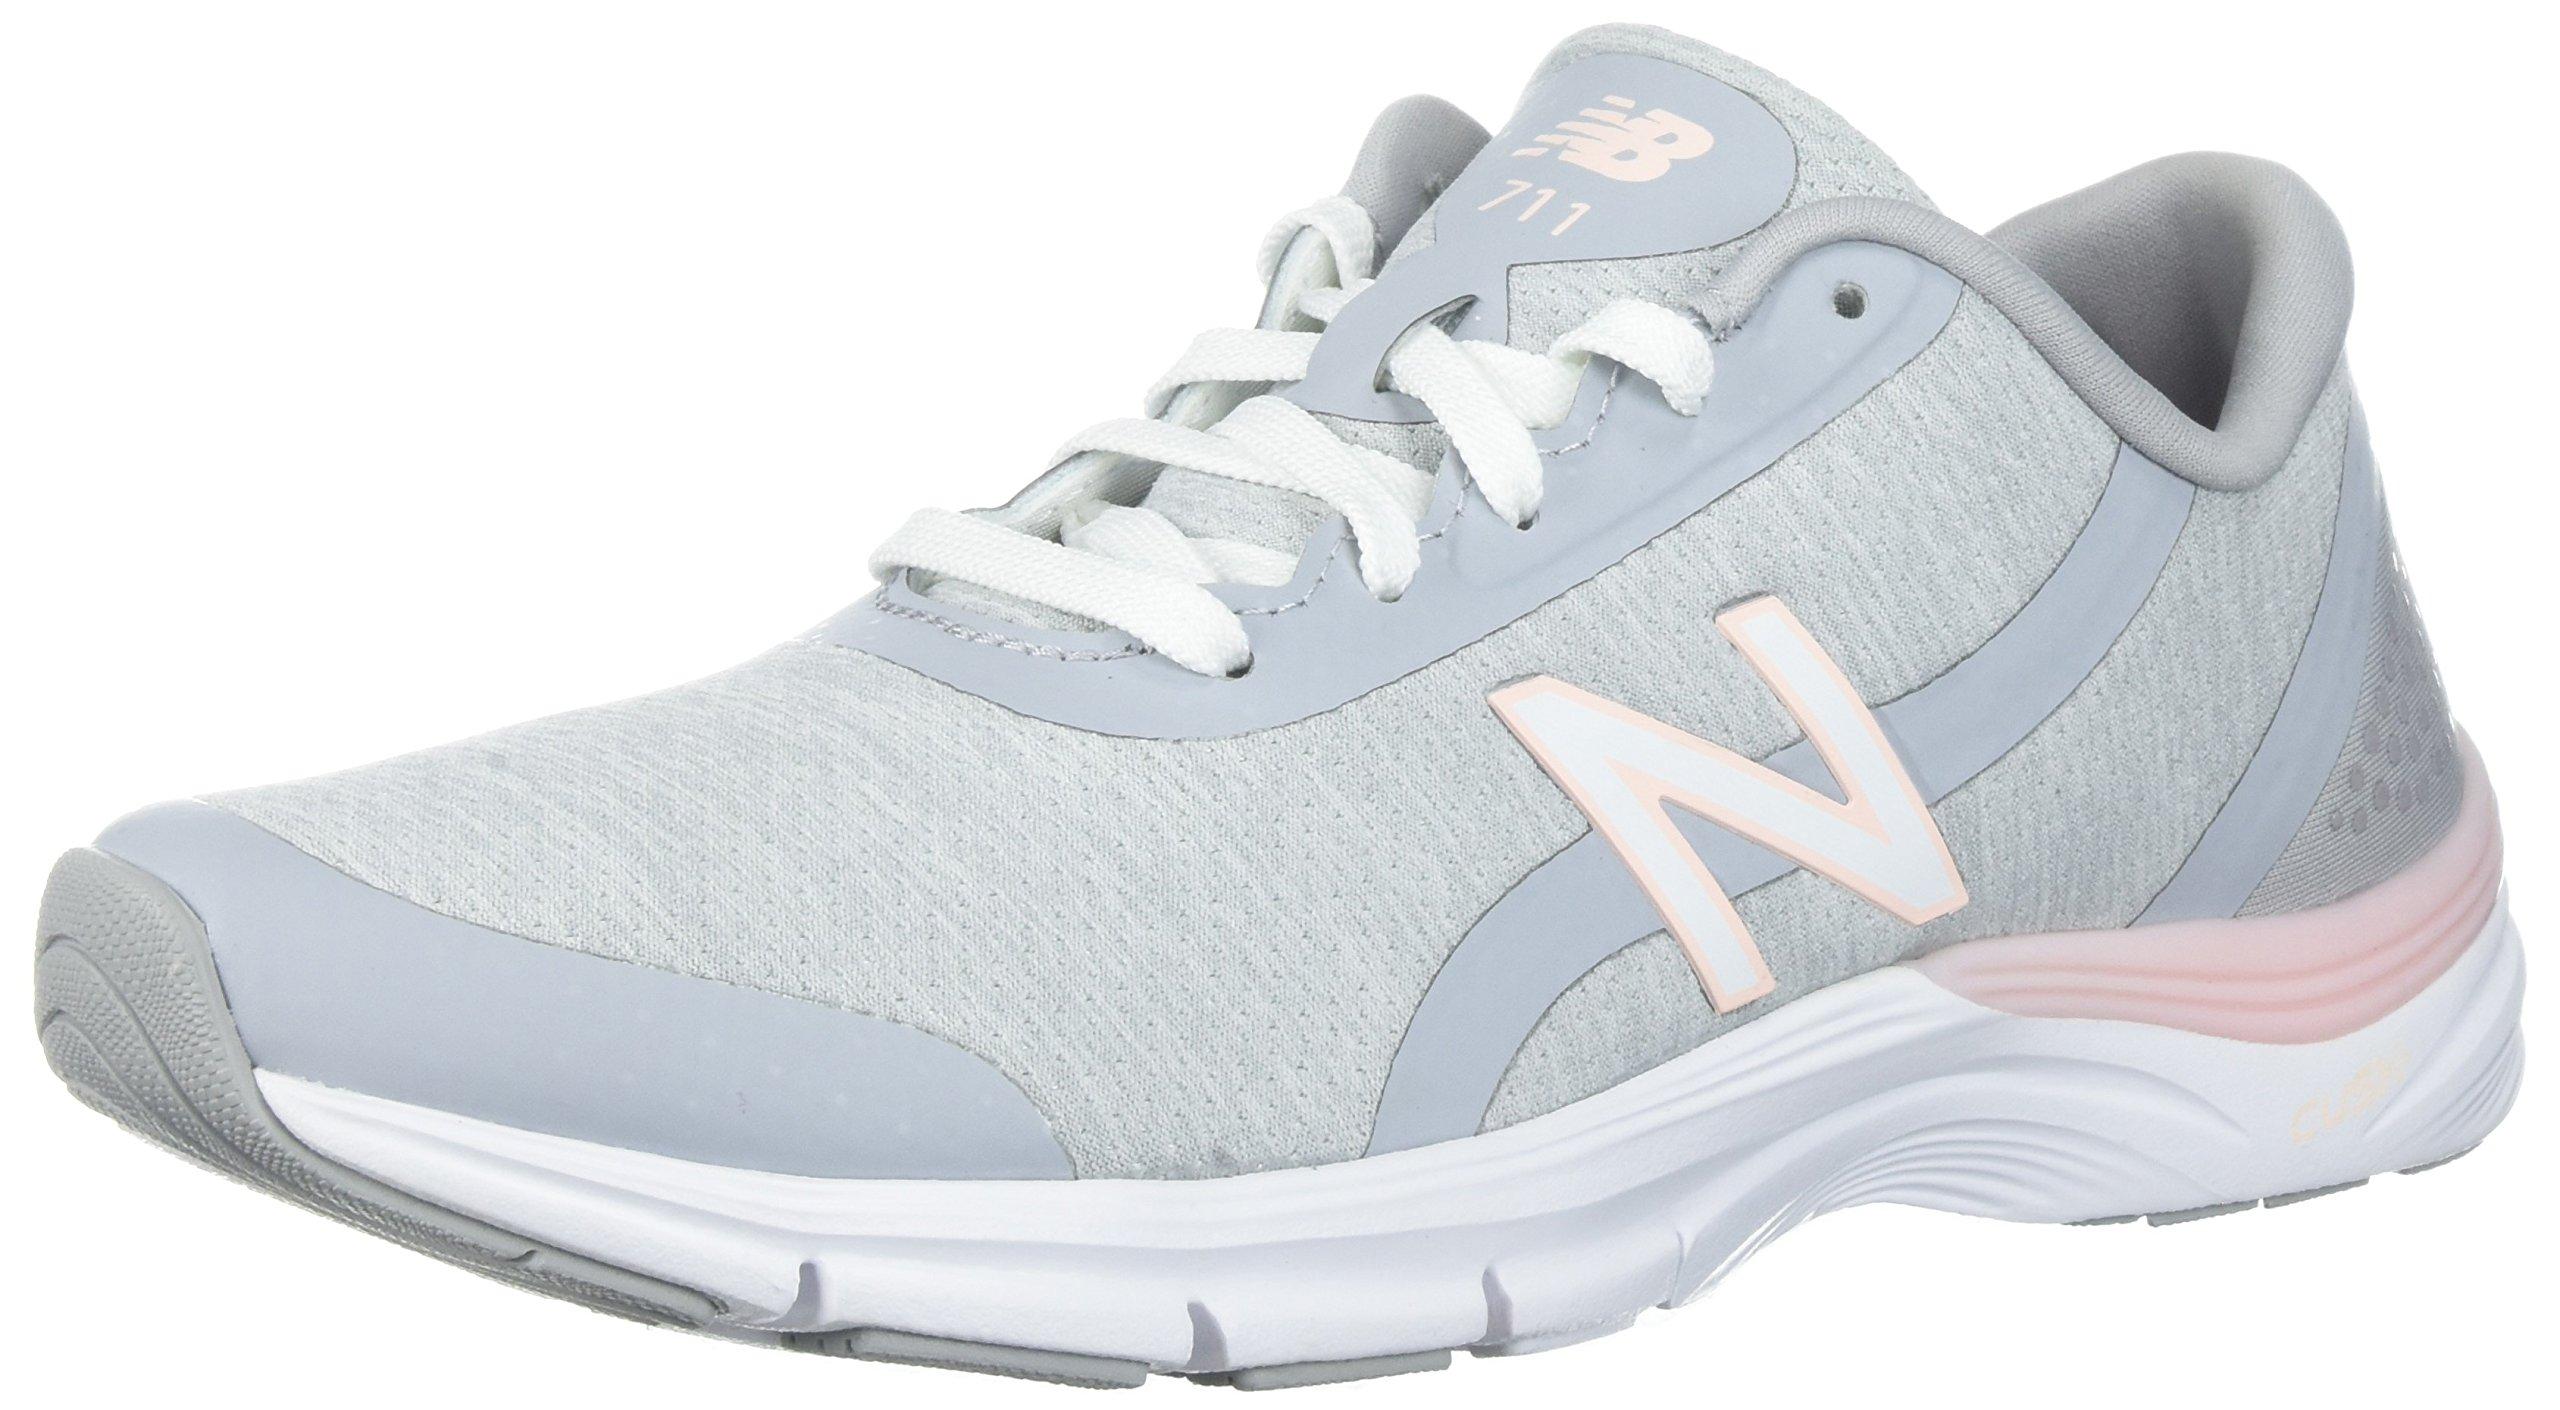 New Balance Women's 711v3 CUSH + Training Shoe, White, 11 B US